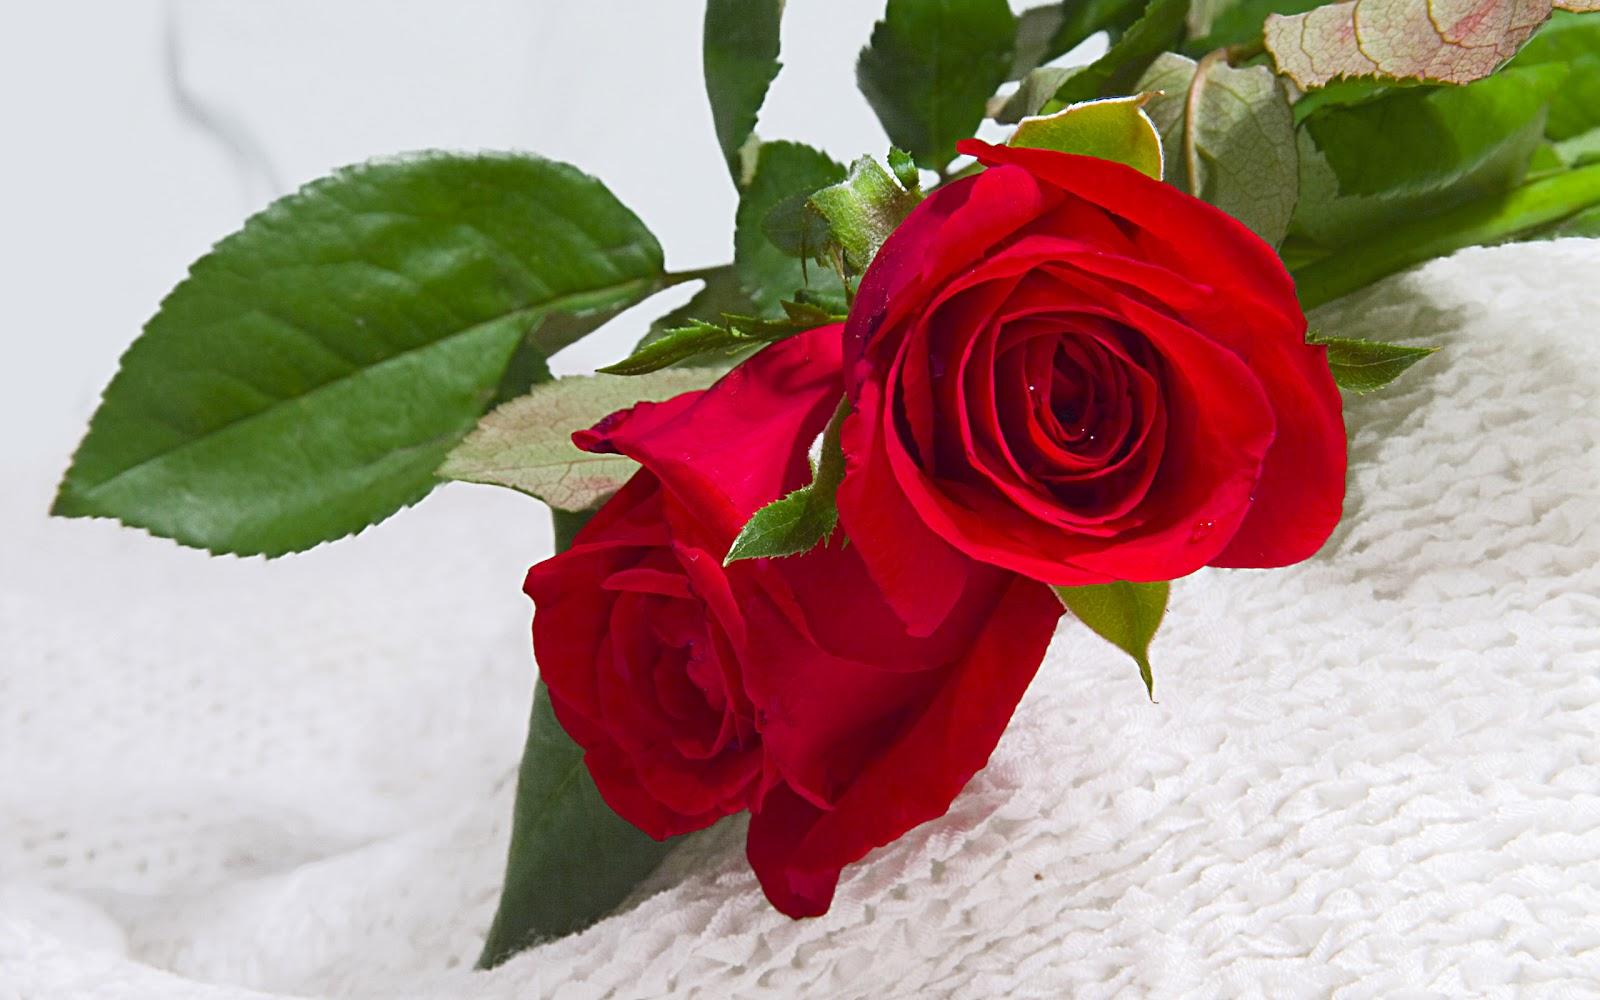 Wallpaper Flower Rose Love Hd